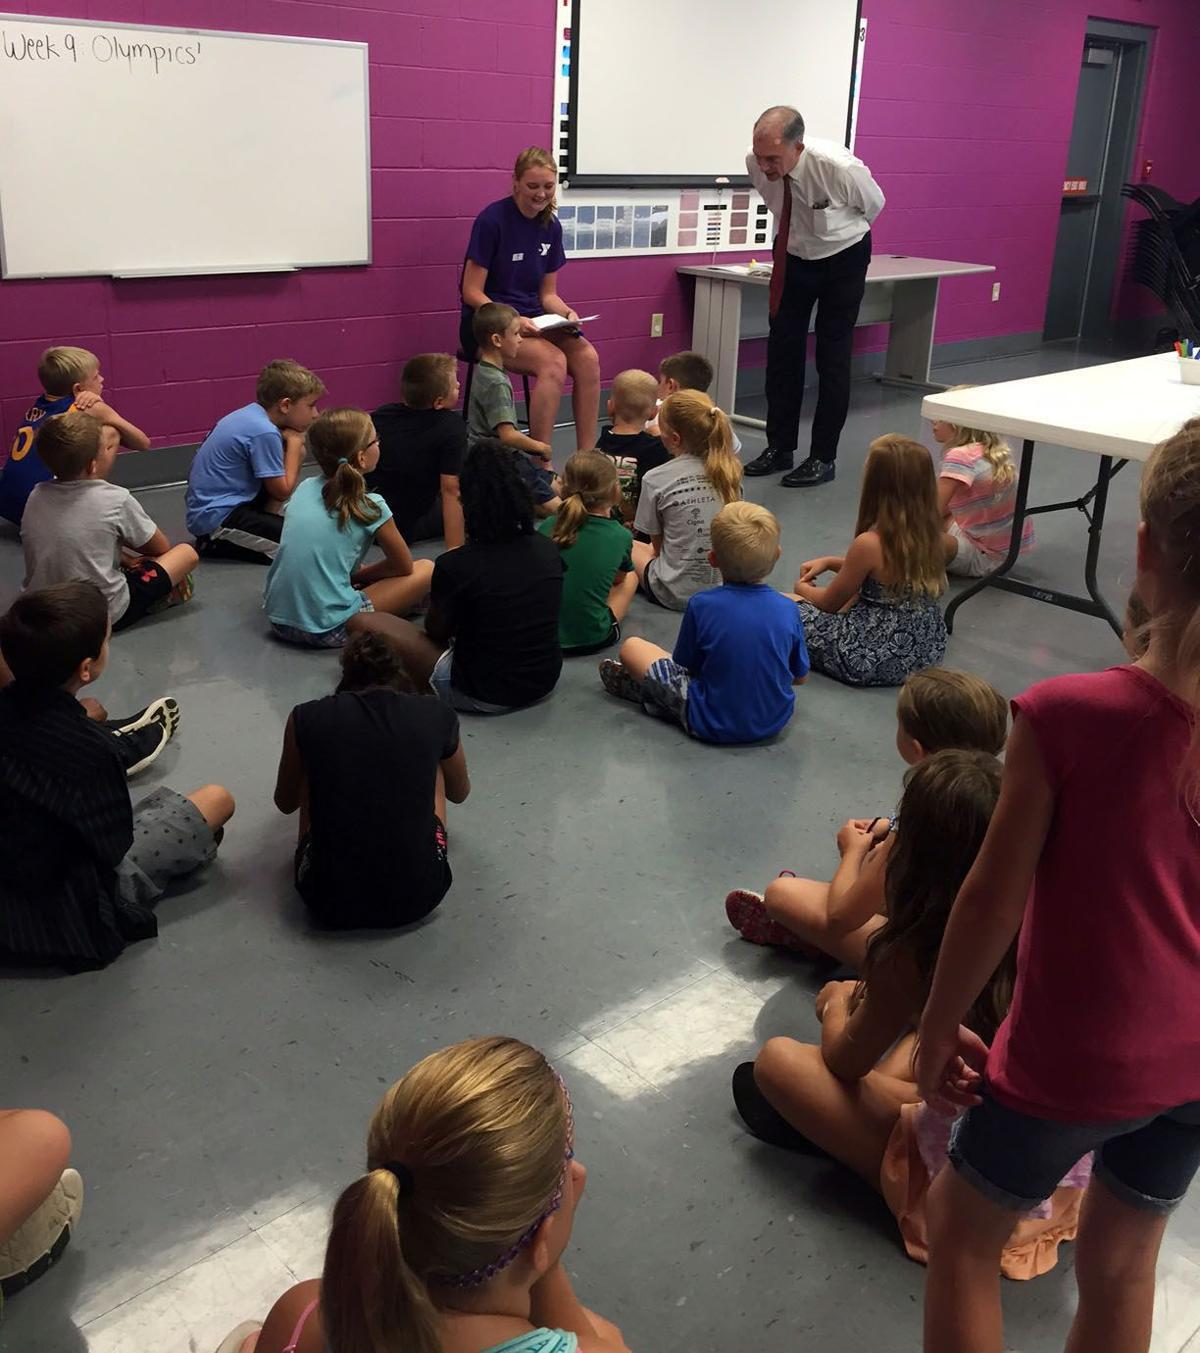 Ymca Youth Camps: Congressman Visclosky Visits Southlake Family YMCA Summer